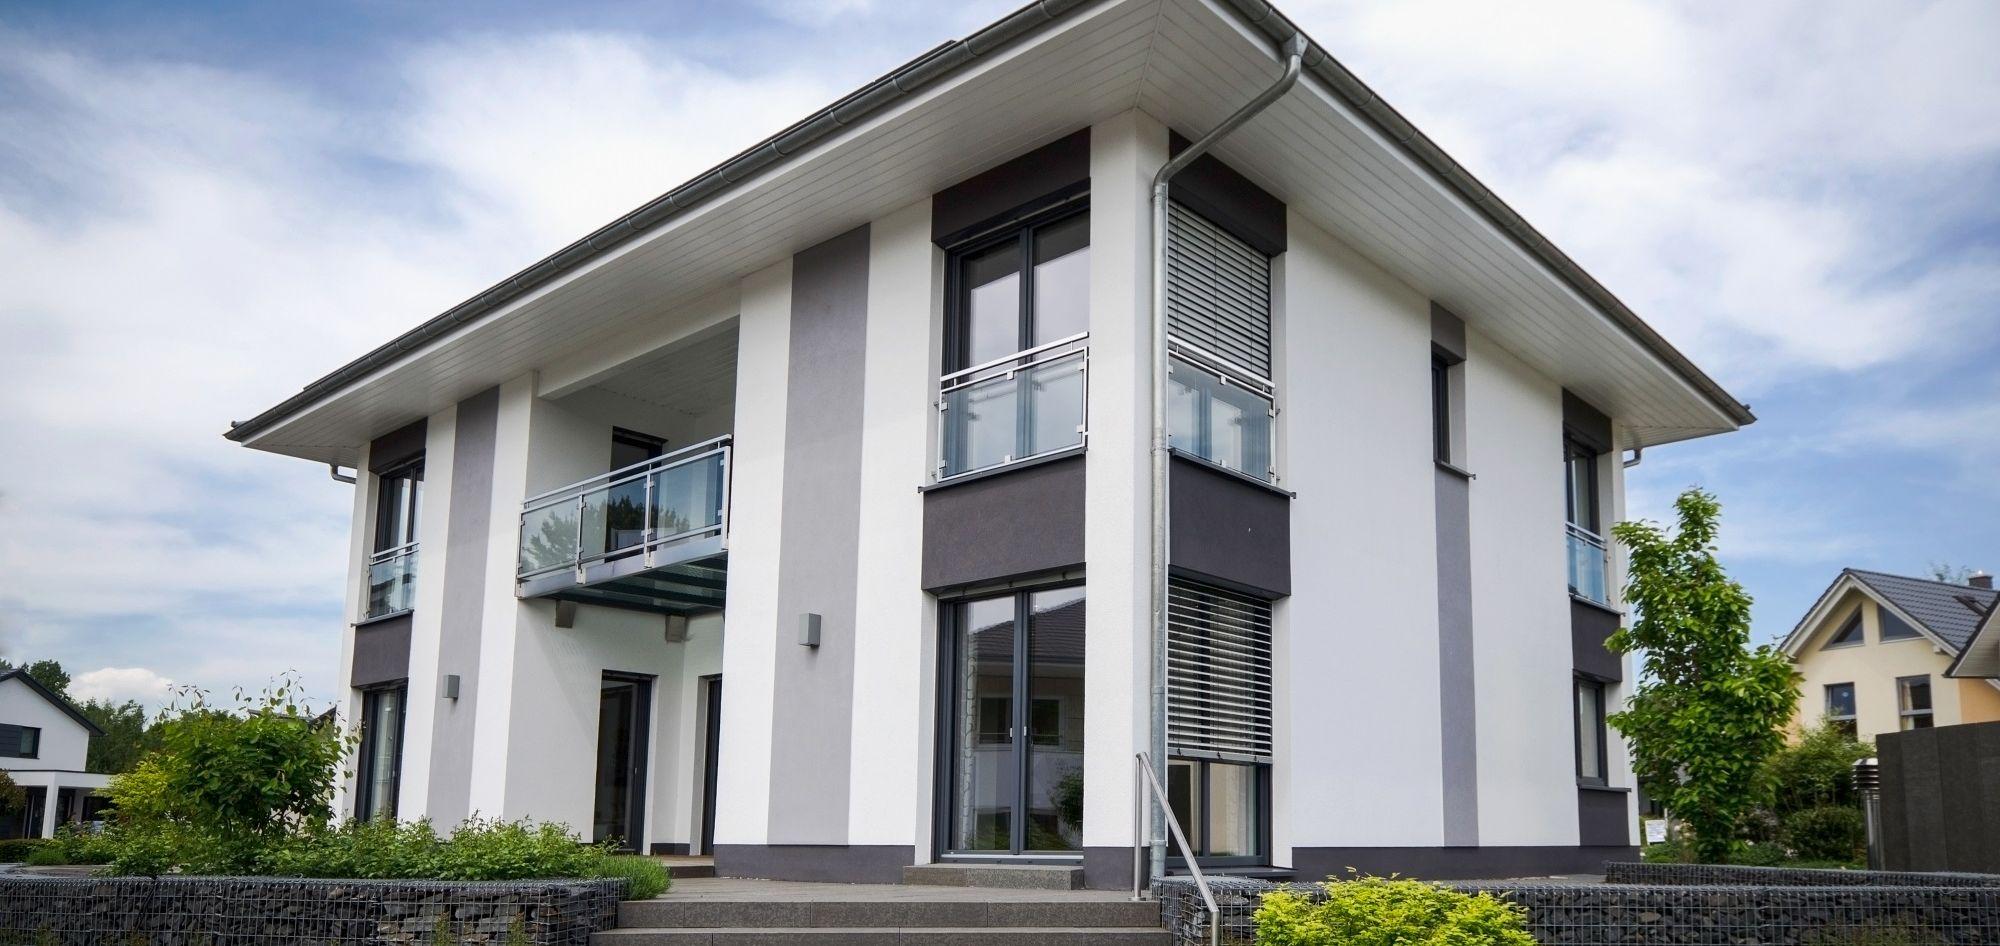 Haus Neubau - 2380 Perchtoldsdorf